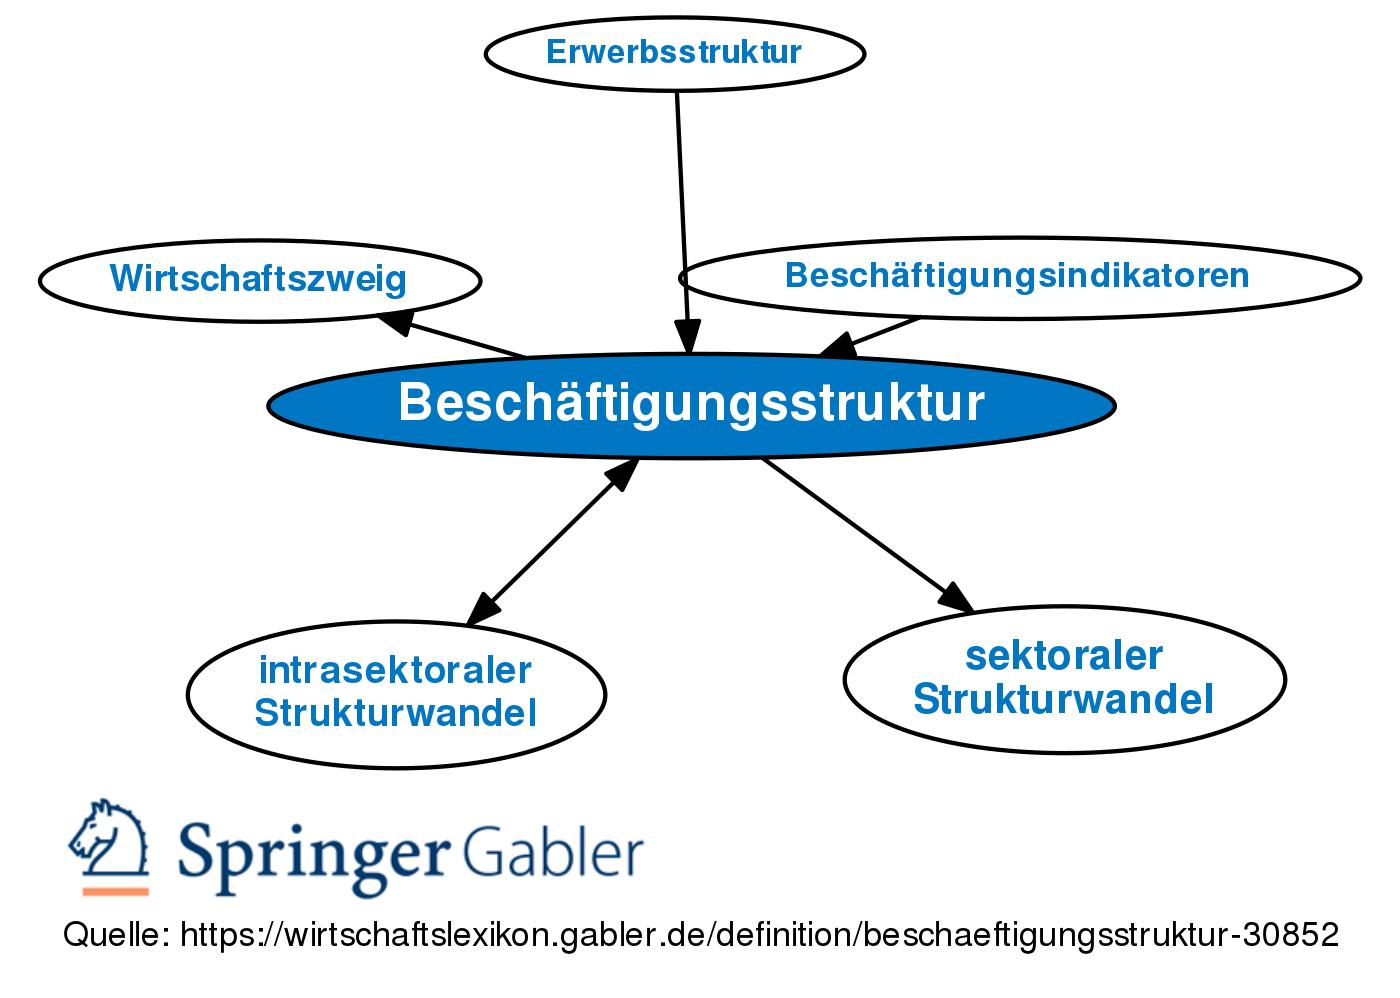 Beschaftigungsstruktur Definition Gabler Wirtschaftslexikon